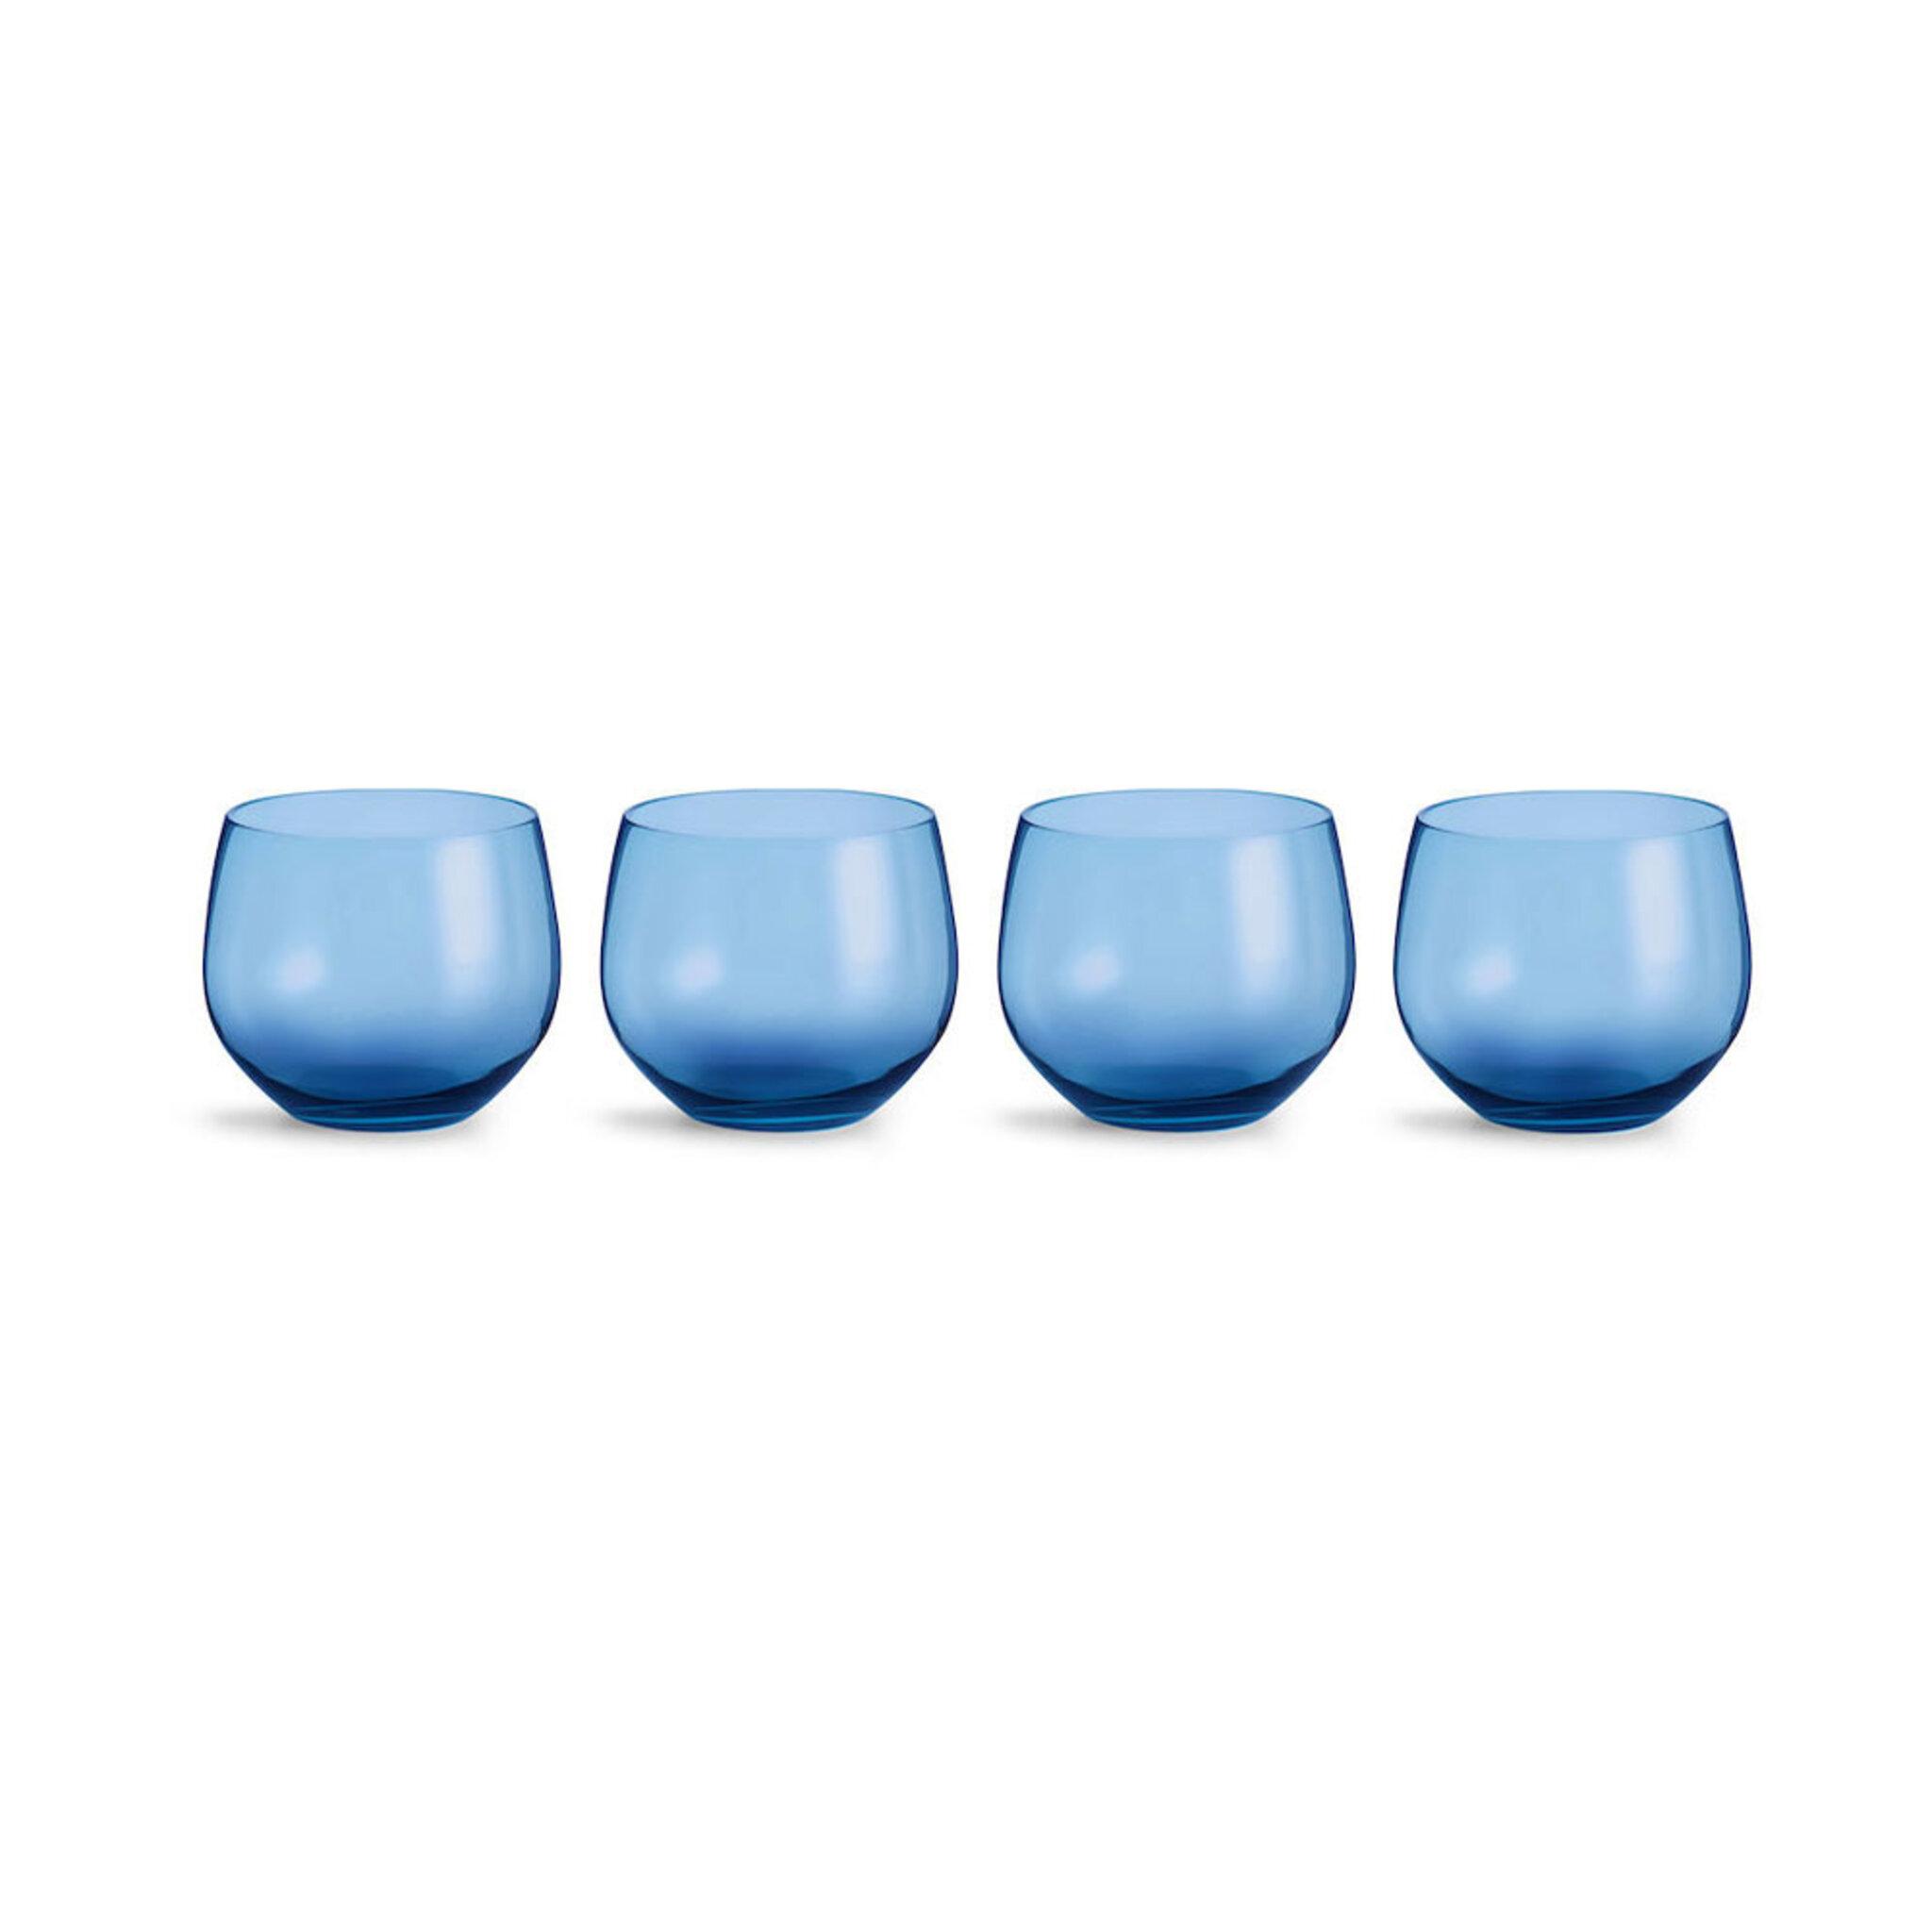 Spectra tumbler 35cl 4-pack blå 35cl H 80 mm Ø 90 mm